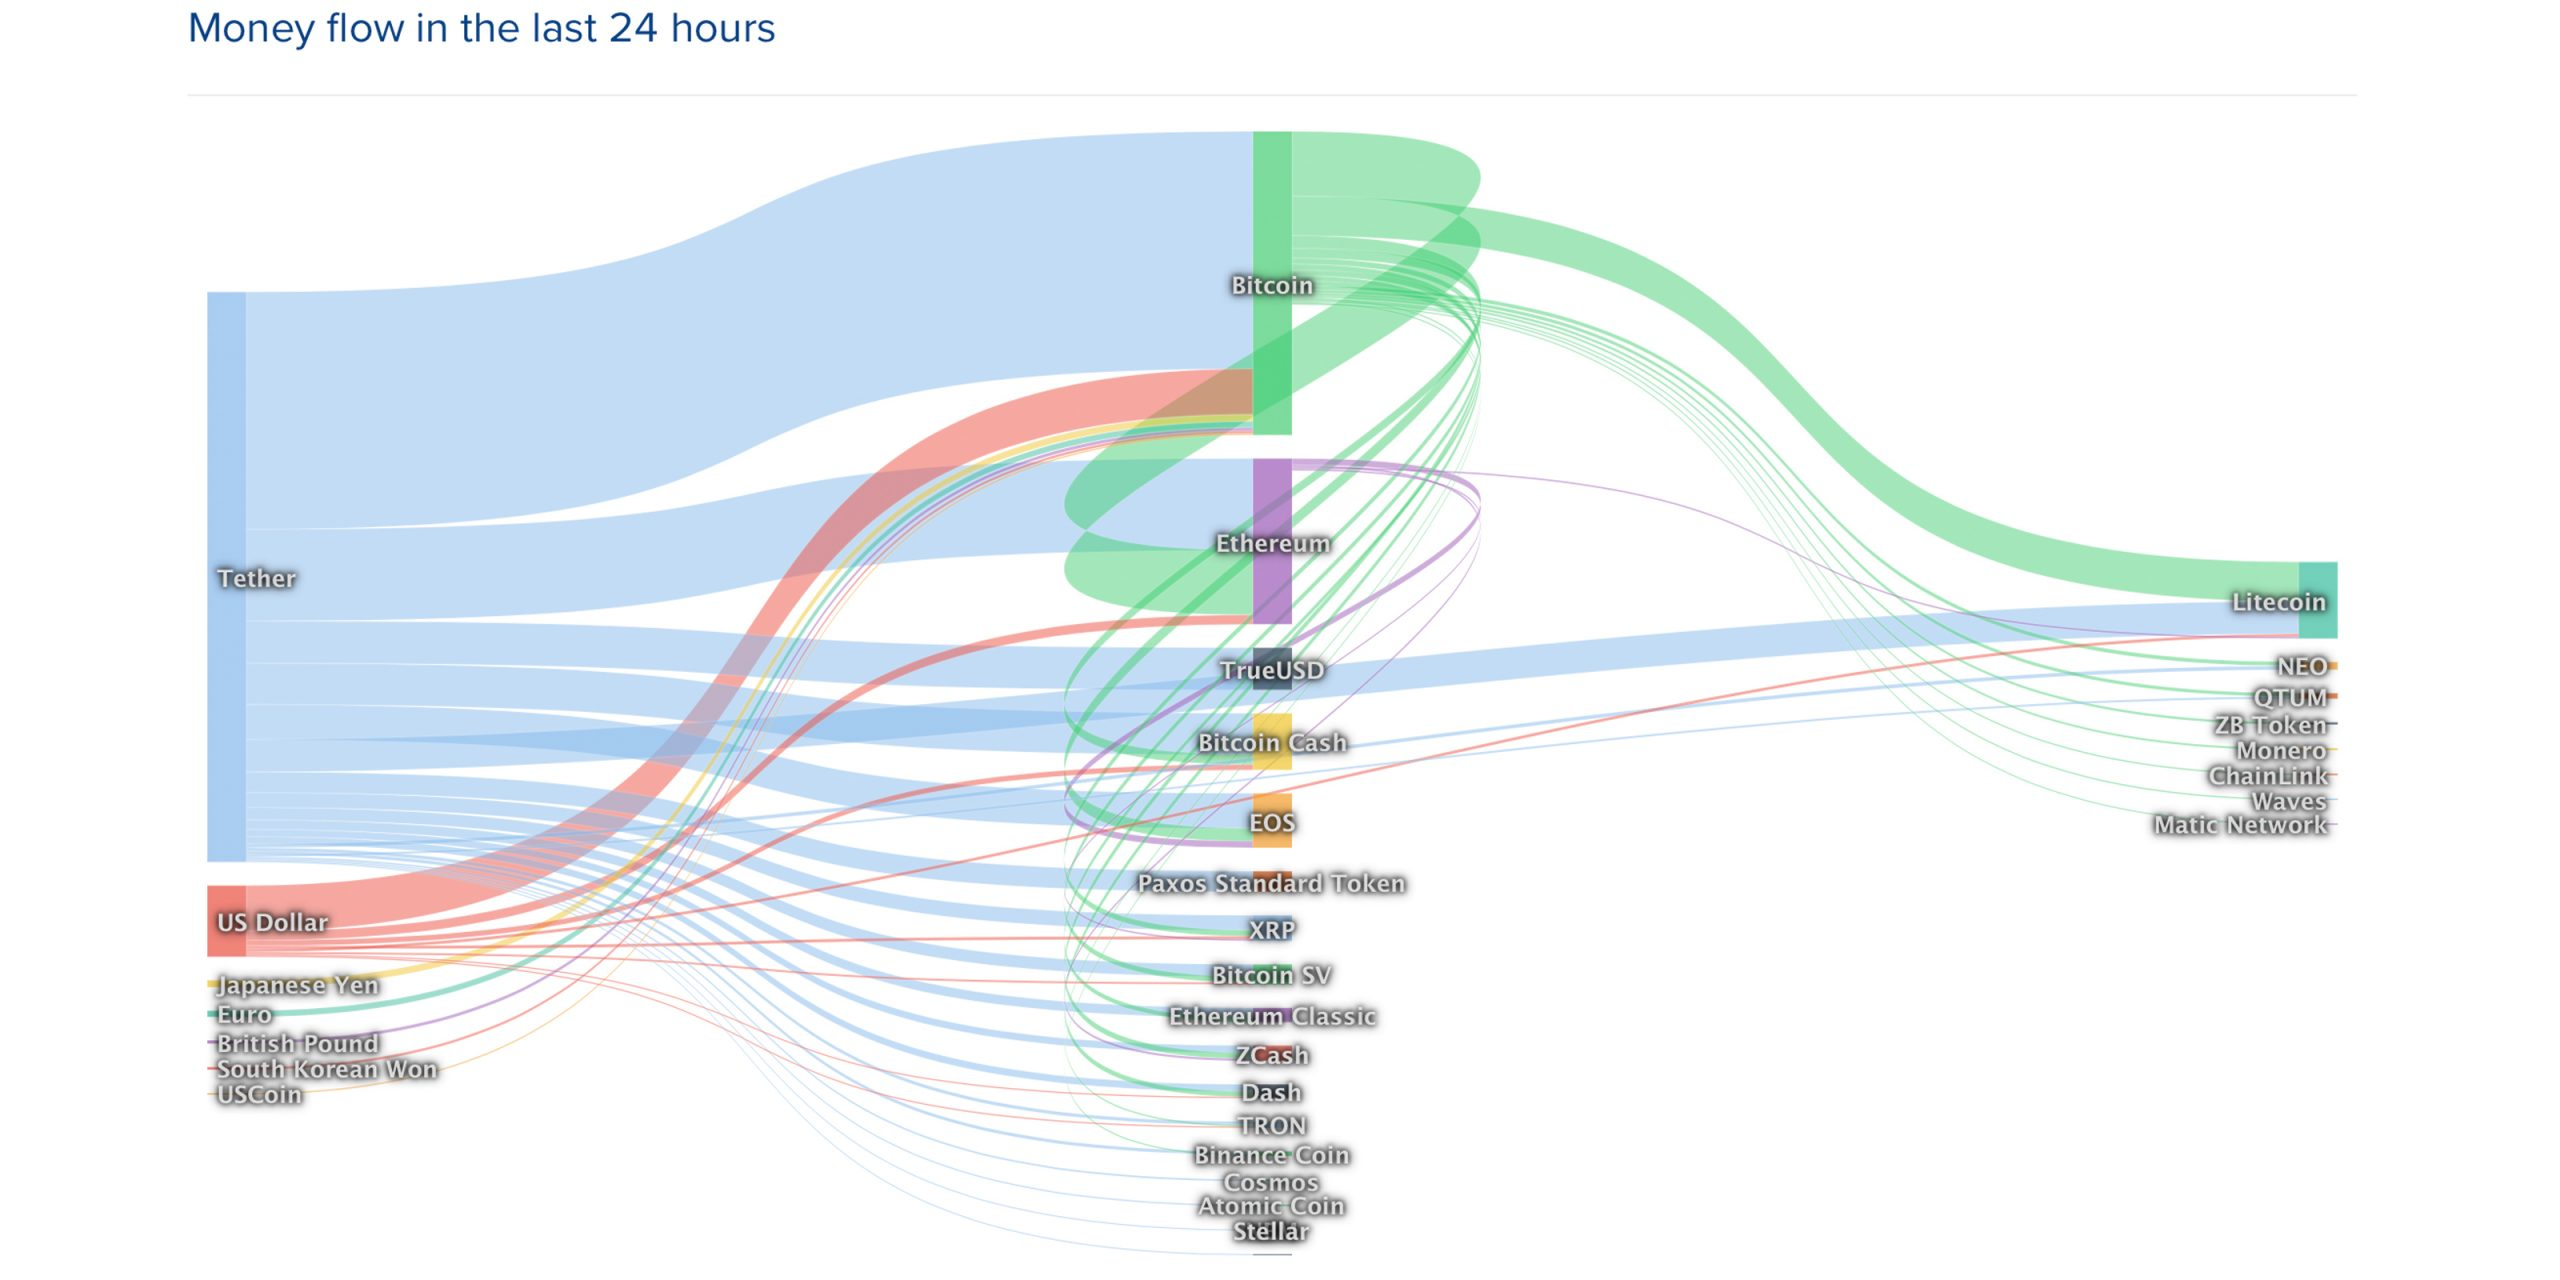 "Perspectiva del mercado: Tendencia alcista envía precios criptográficos hacia el norte"" ancho = ""2560"" altura = ""1280 ""srcset ="" https://blackswanfinances.com/wp-content/uploads/2020/01/flojohhsnndh777777-scaled.jpg 2560w, https://news.bitcoin.com/wp-content/uploads/2020/01 /flojohhsnndh777777-300x150.jpg 300w, https://news.bitcoin.com/wp-content/uploads/2020/01/flojohhsnndh777777-1024x512.jpg 1024w, https://news.bitcoin.com/wp-content/uploads /2020/01/flojohhsnndh777777-768x384.jpg 768w, https://news.bitcoin.com/wp-content/uploads/2020/01/flojohhsnndh777777-1536x768.jpg 1536w, https://news.bitcoin.com/wp -content / uploads / 2020/01 / flojohhsnndh777777-2048x1024.jpg 2048w, https://news.bitcoin.com/wp-content/uploads/2020/01/flojohhsnndh777777-696x348.jpg 696w, https://news.bitcoin.com/wp-content/uploads/2020/01/flojohhsnndh777777 -1392x696.jpg 1392w, https://news.bitcoin.com/wp-content/uploads/2020/01/flojohhsnndh777777-1068x534.jpg 1068w, https://news.bitcoin.com/wp-content/uploads/2020 /01/flojohhsnndh777777-840x420.jpg 840w, https://news.bitcoin.com/wp-content/uploads/2020/01/flojohhsnndh777777-1920x960.jpg 1920w ""tamaños ="" (ancho máximo: 2560px) 100vw, 2560px"